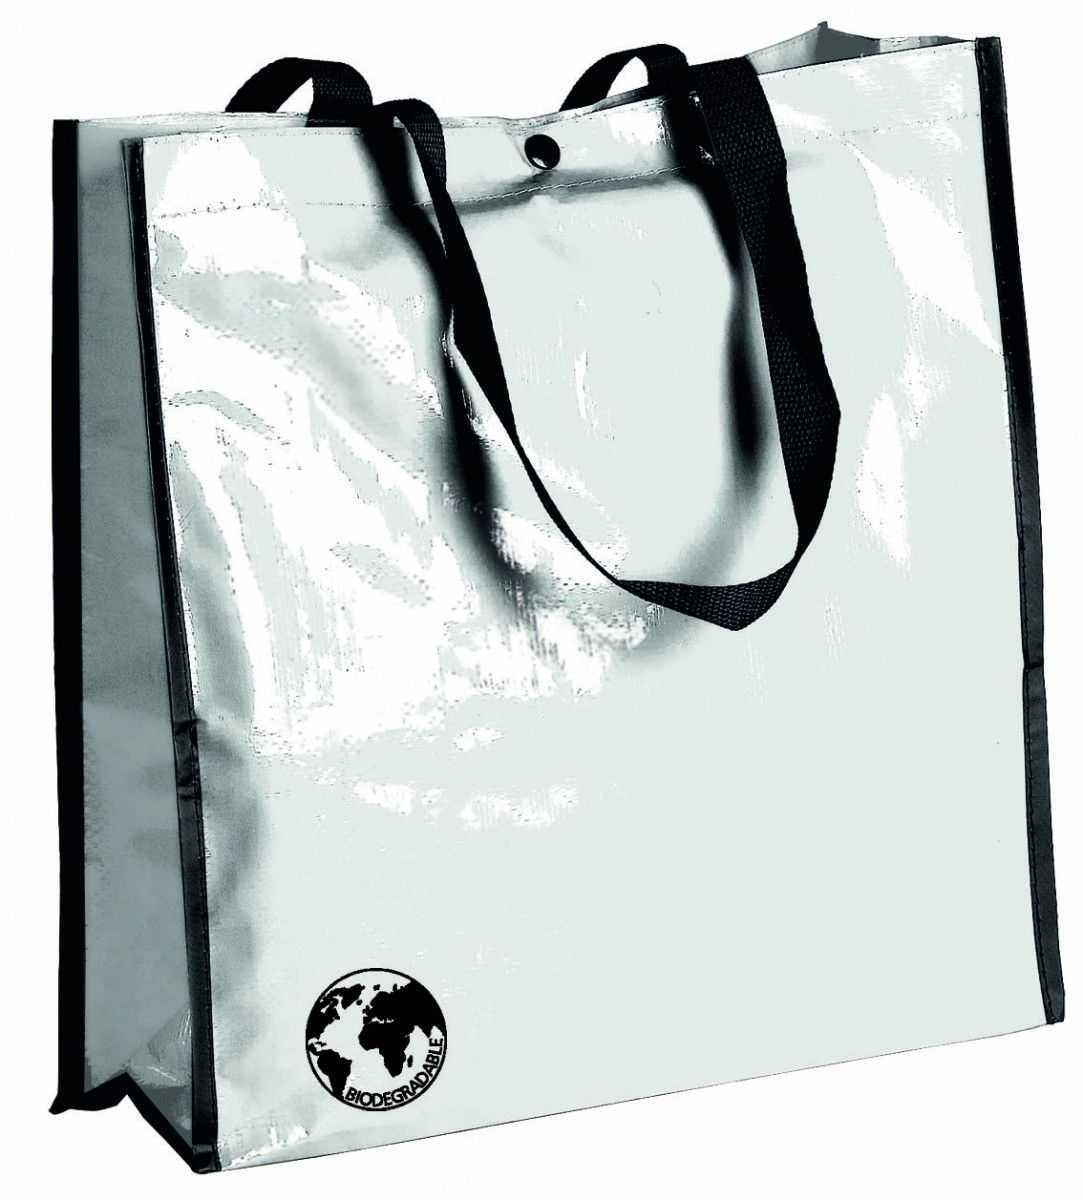 Medidas: 38x38x12,5cm Área máxima de marcaje: 20x20 cm Material:TNT biodegradable